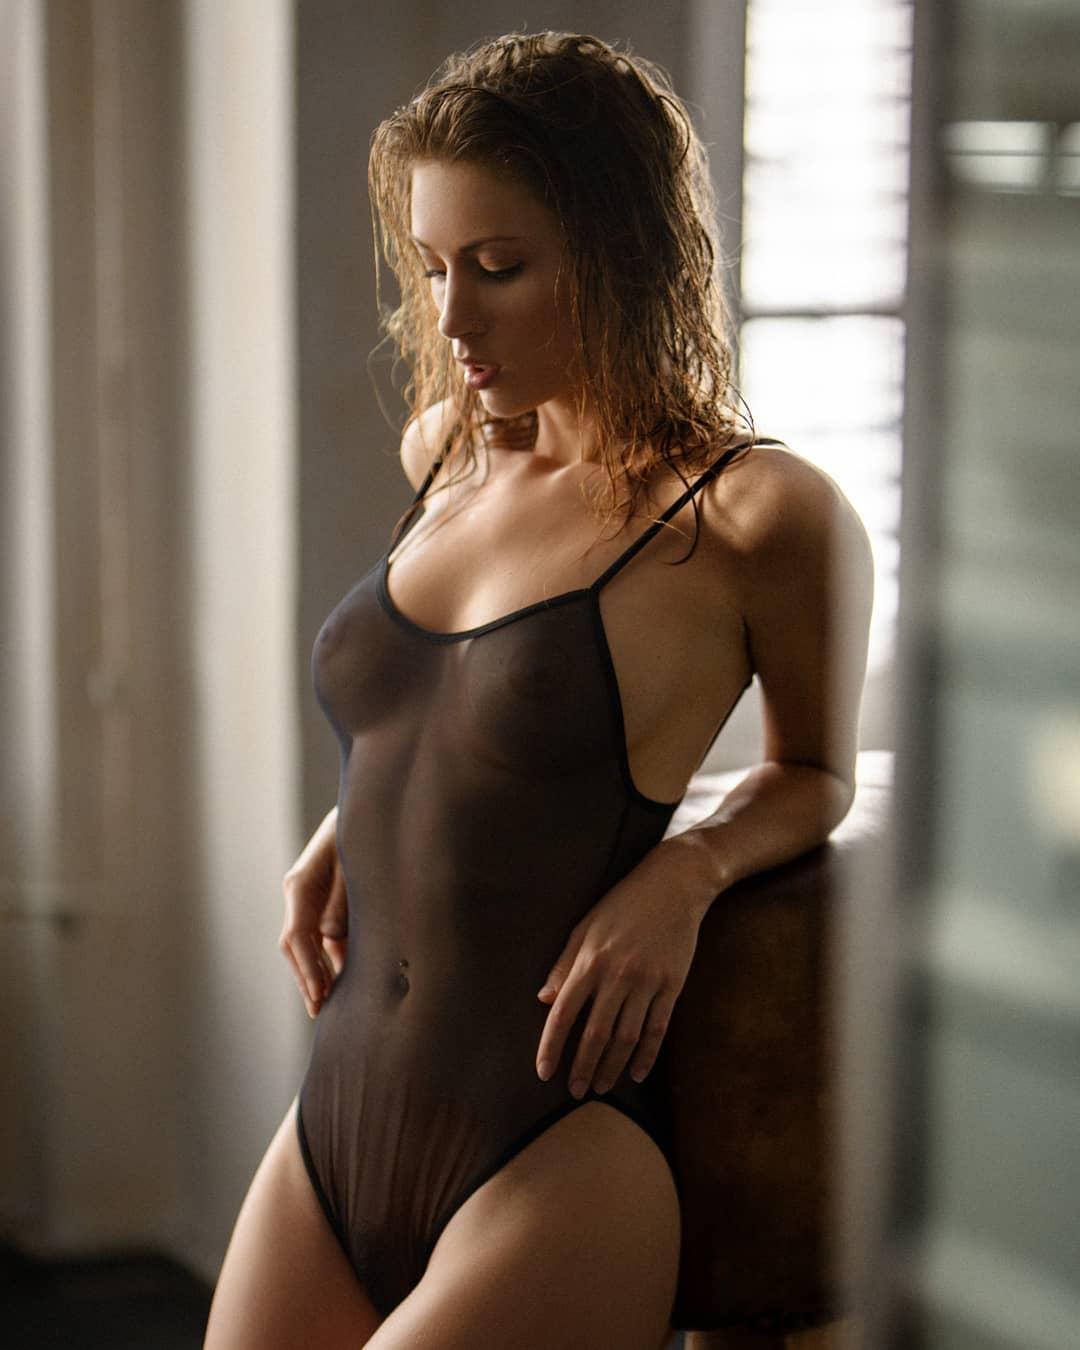 XXX Muliniel Louis nude photos 2019